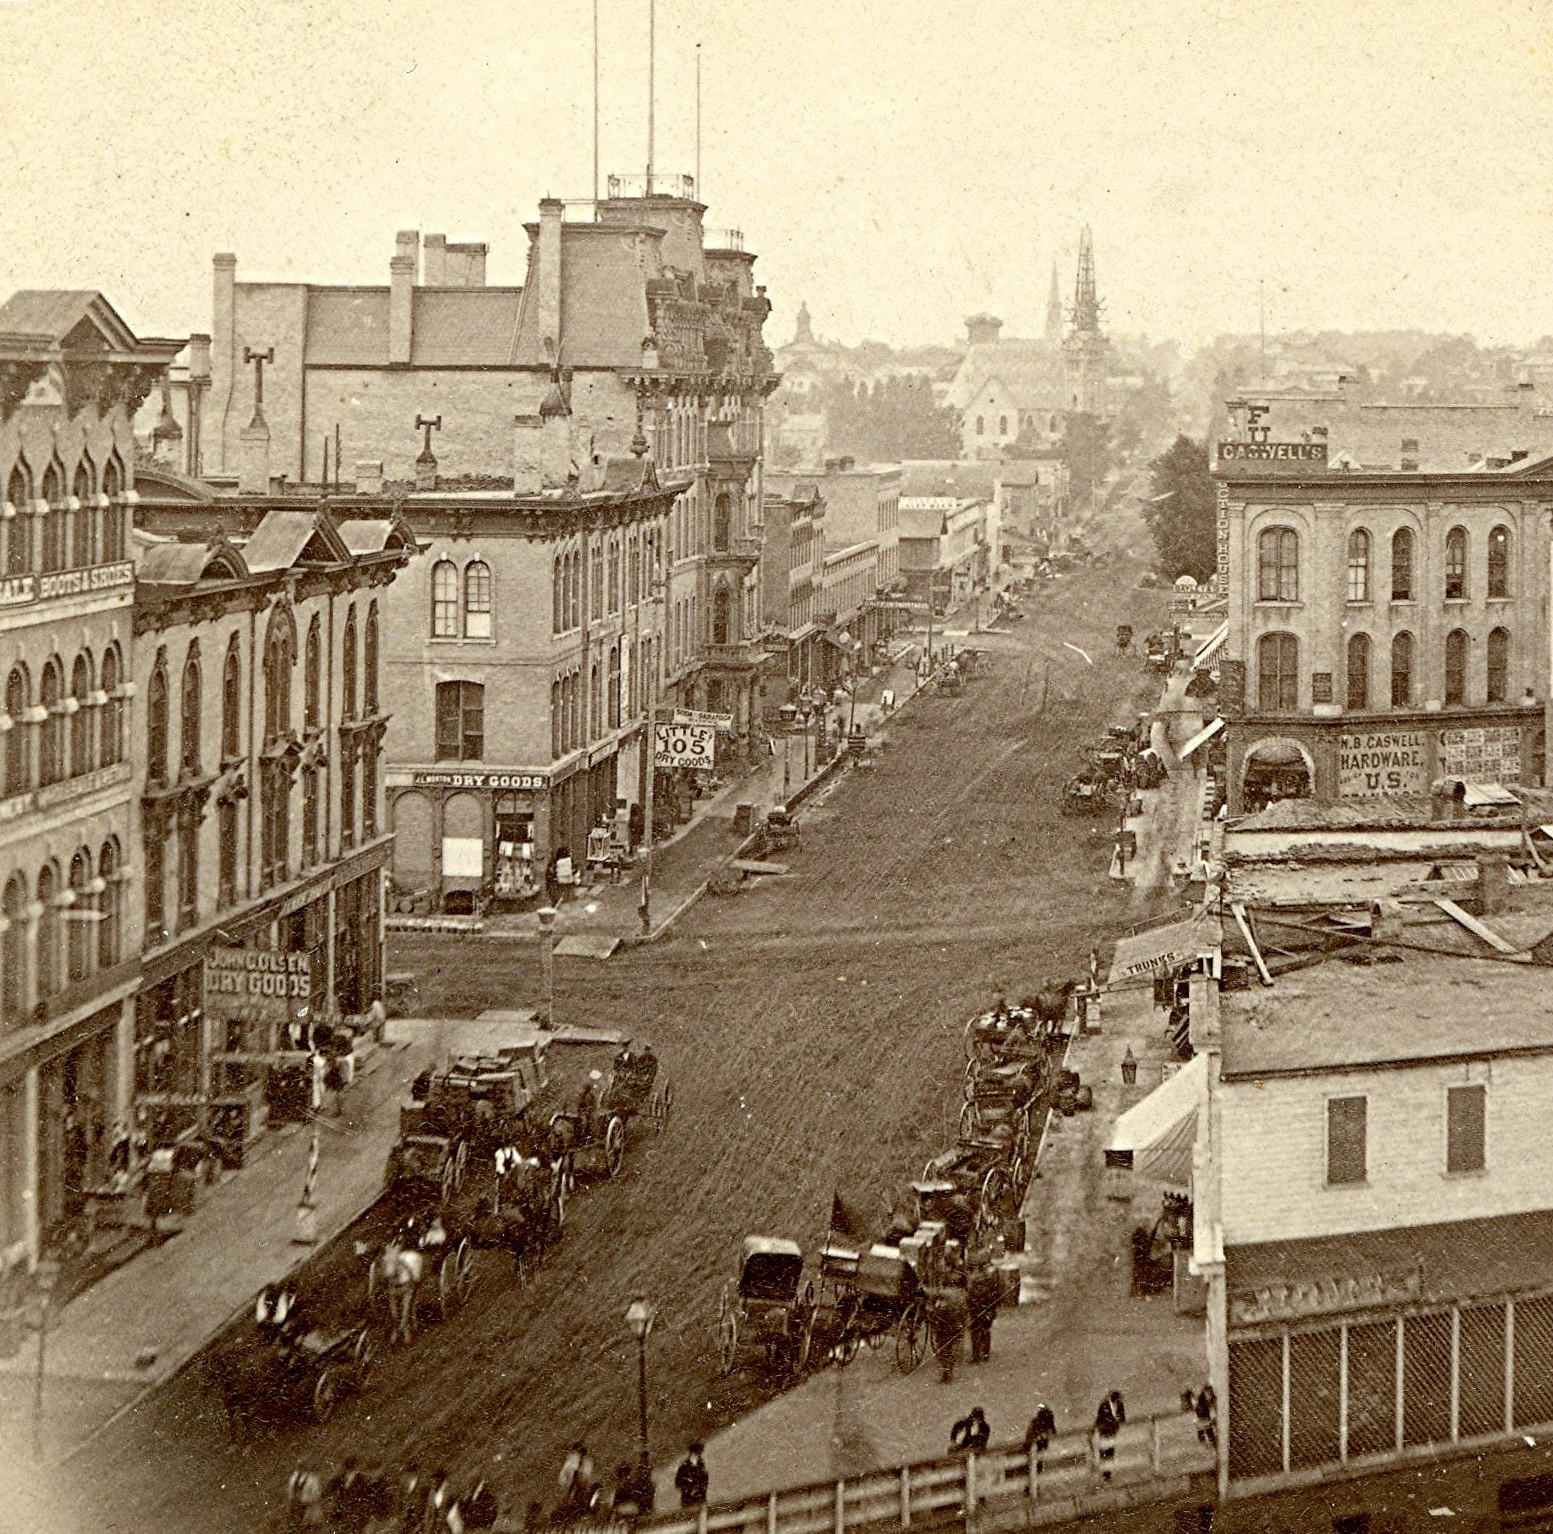 Plankinton House Hotel, 1869